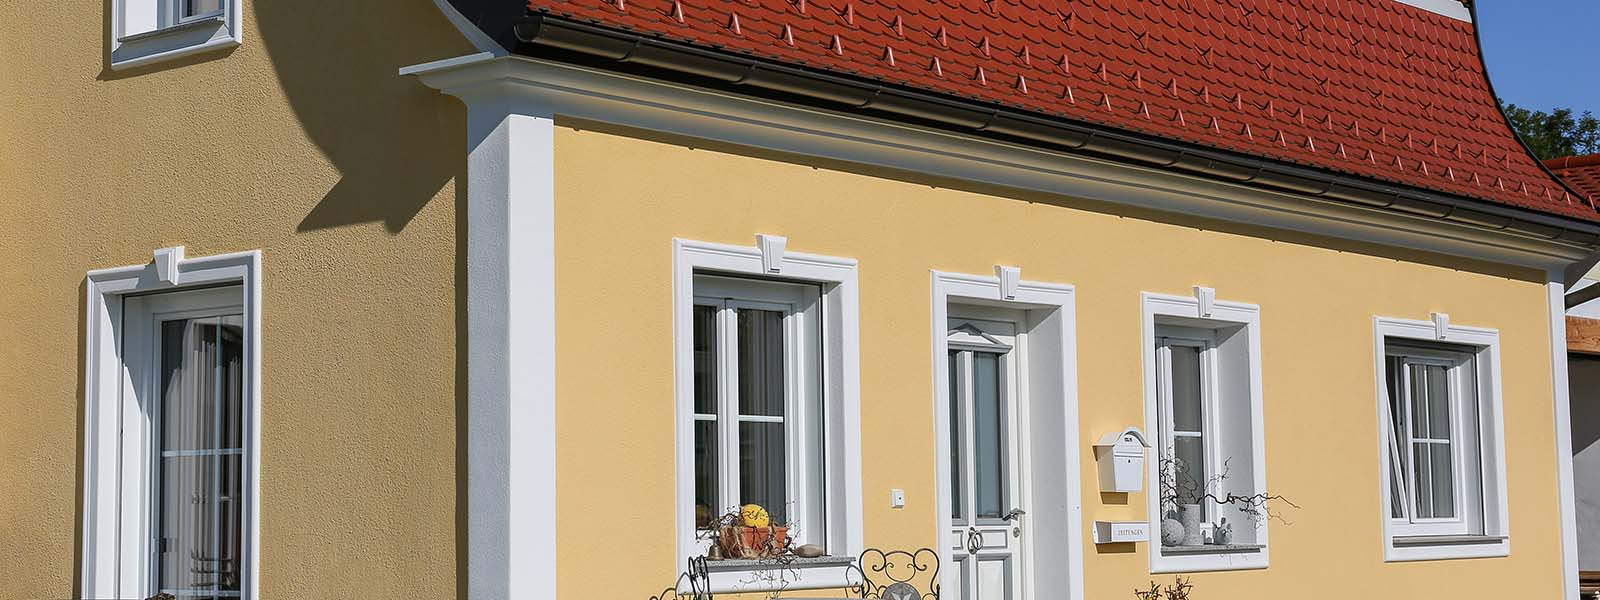 Fassadenprofile-Fassadengestaltung-Fassadenelemente